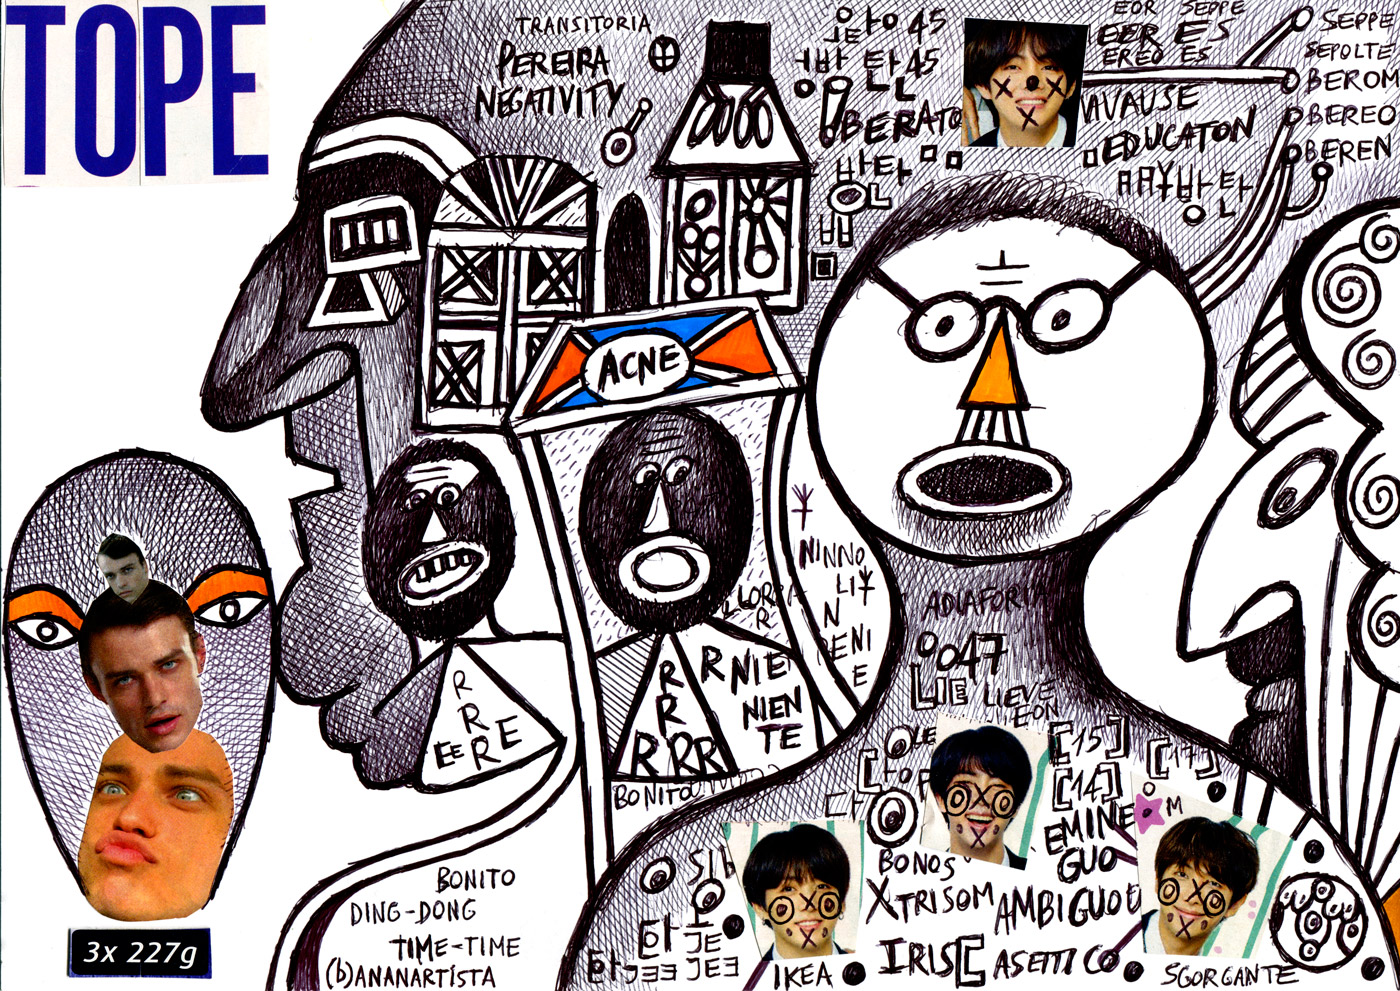 TOPE 3 x 227 - Pereira Negativity Acne - original drawing collage (b)ananartista sbuff